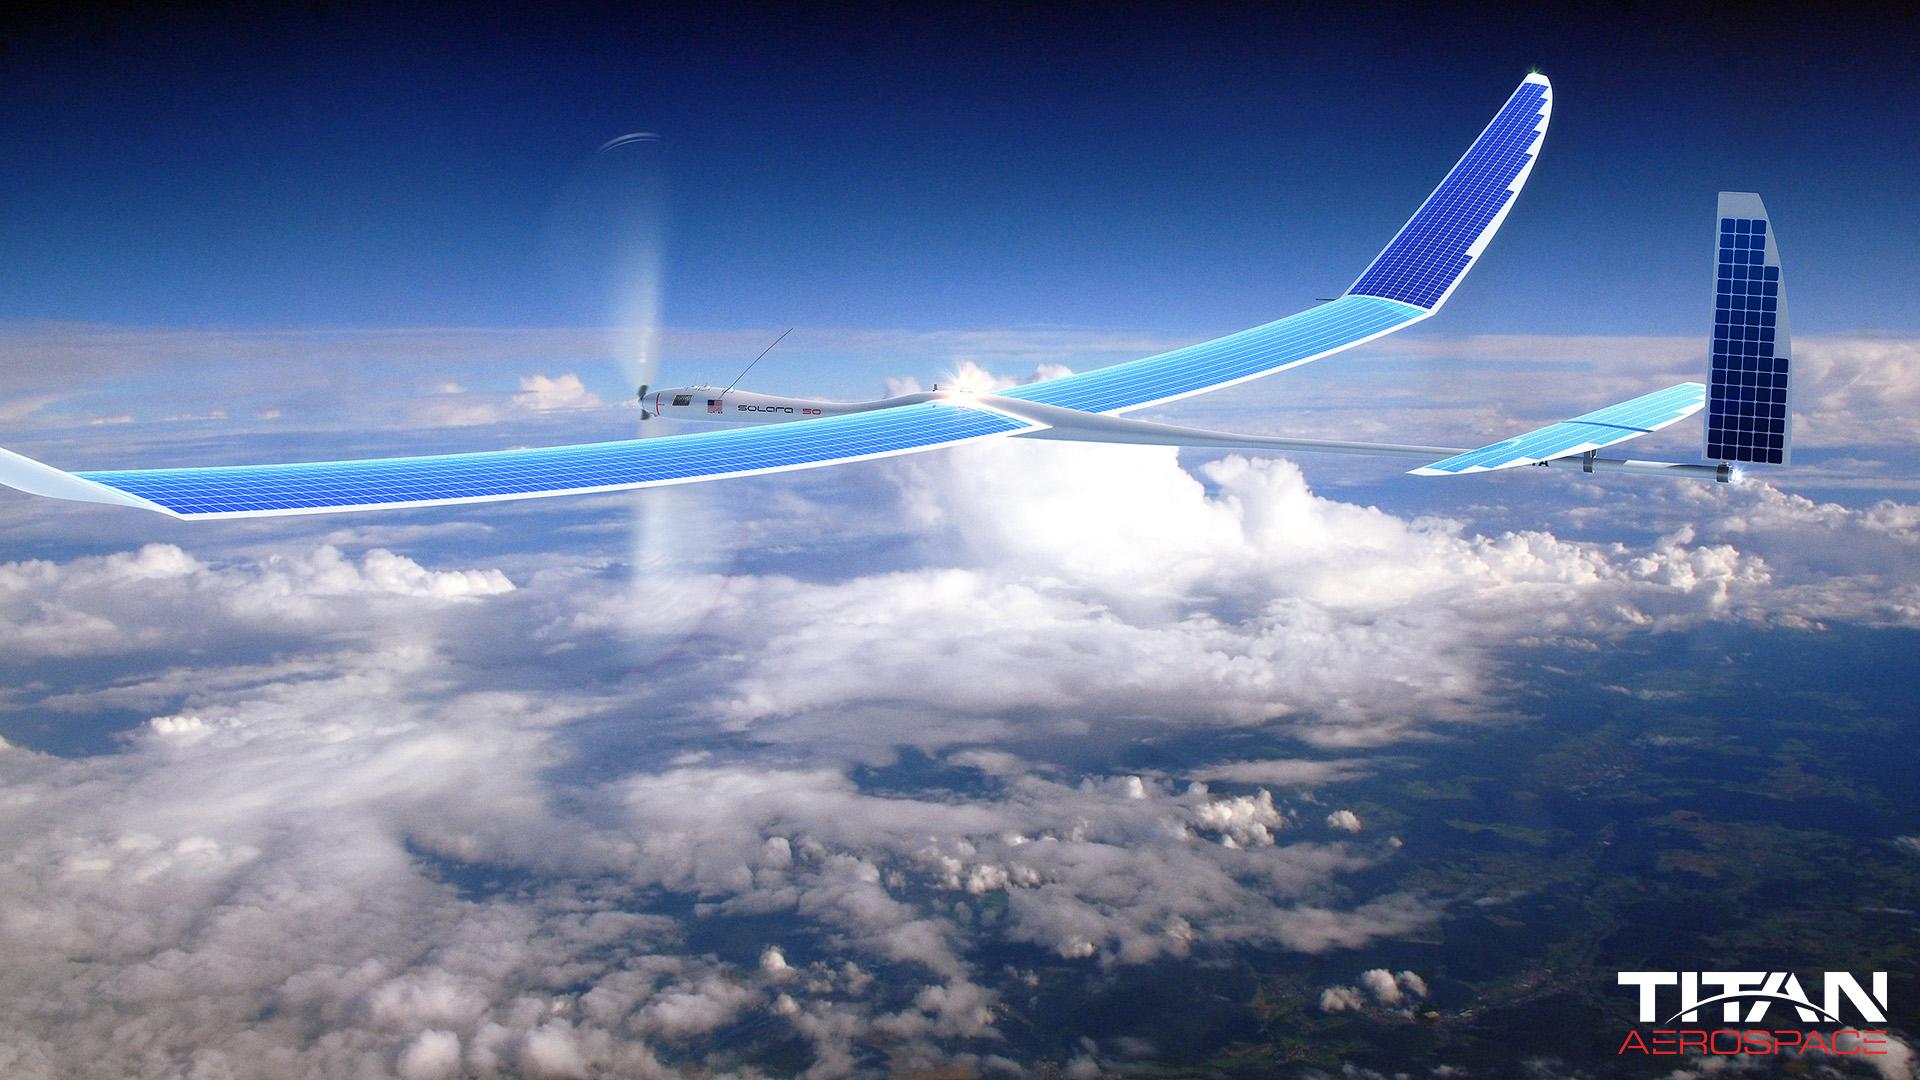 Artist's rendering of Solara 50 at high altitude.